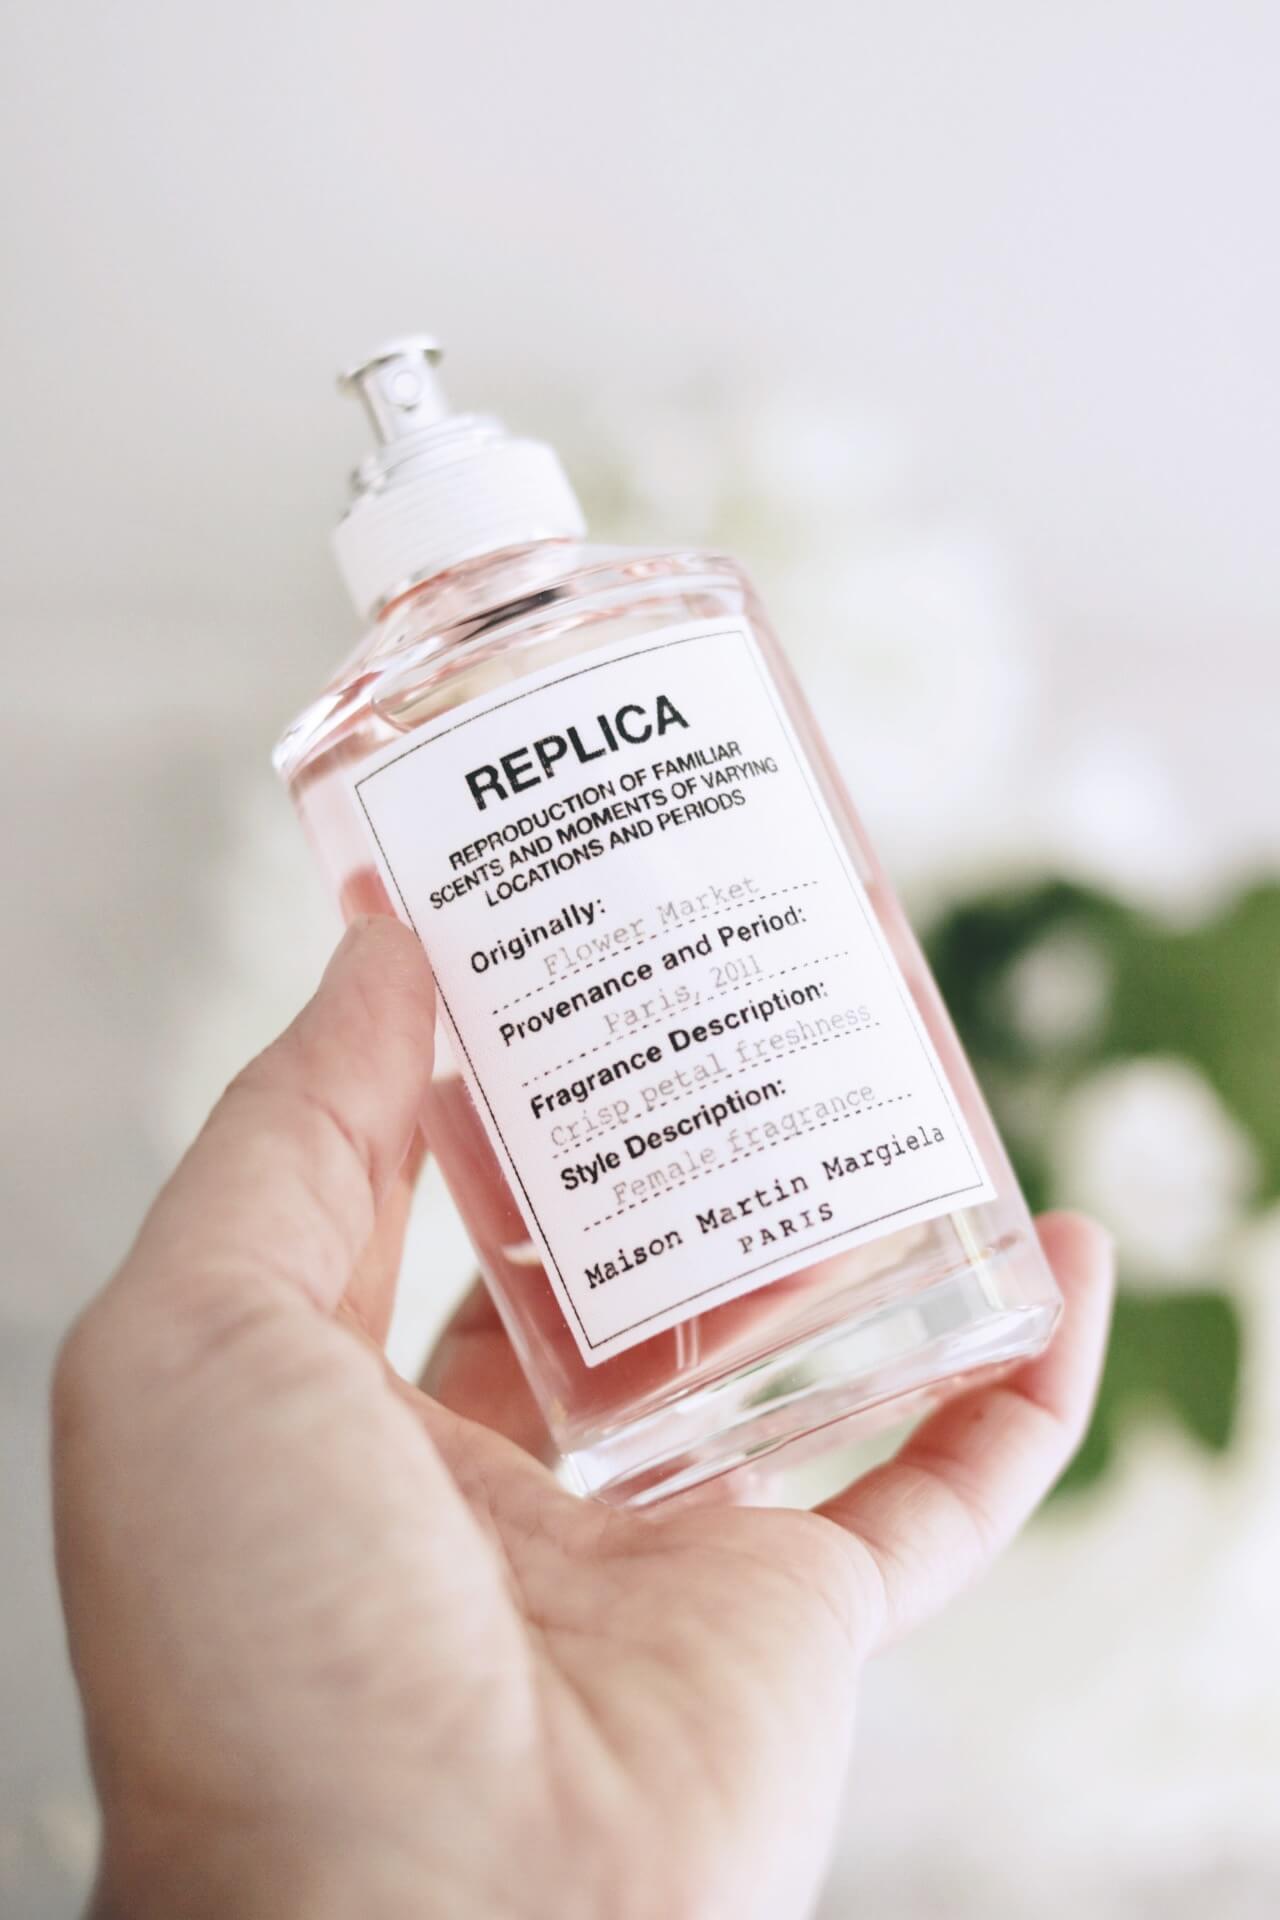 Jillian Harris Holding Replica Perfume by Maison Martin Margiella